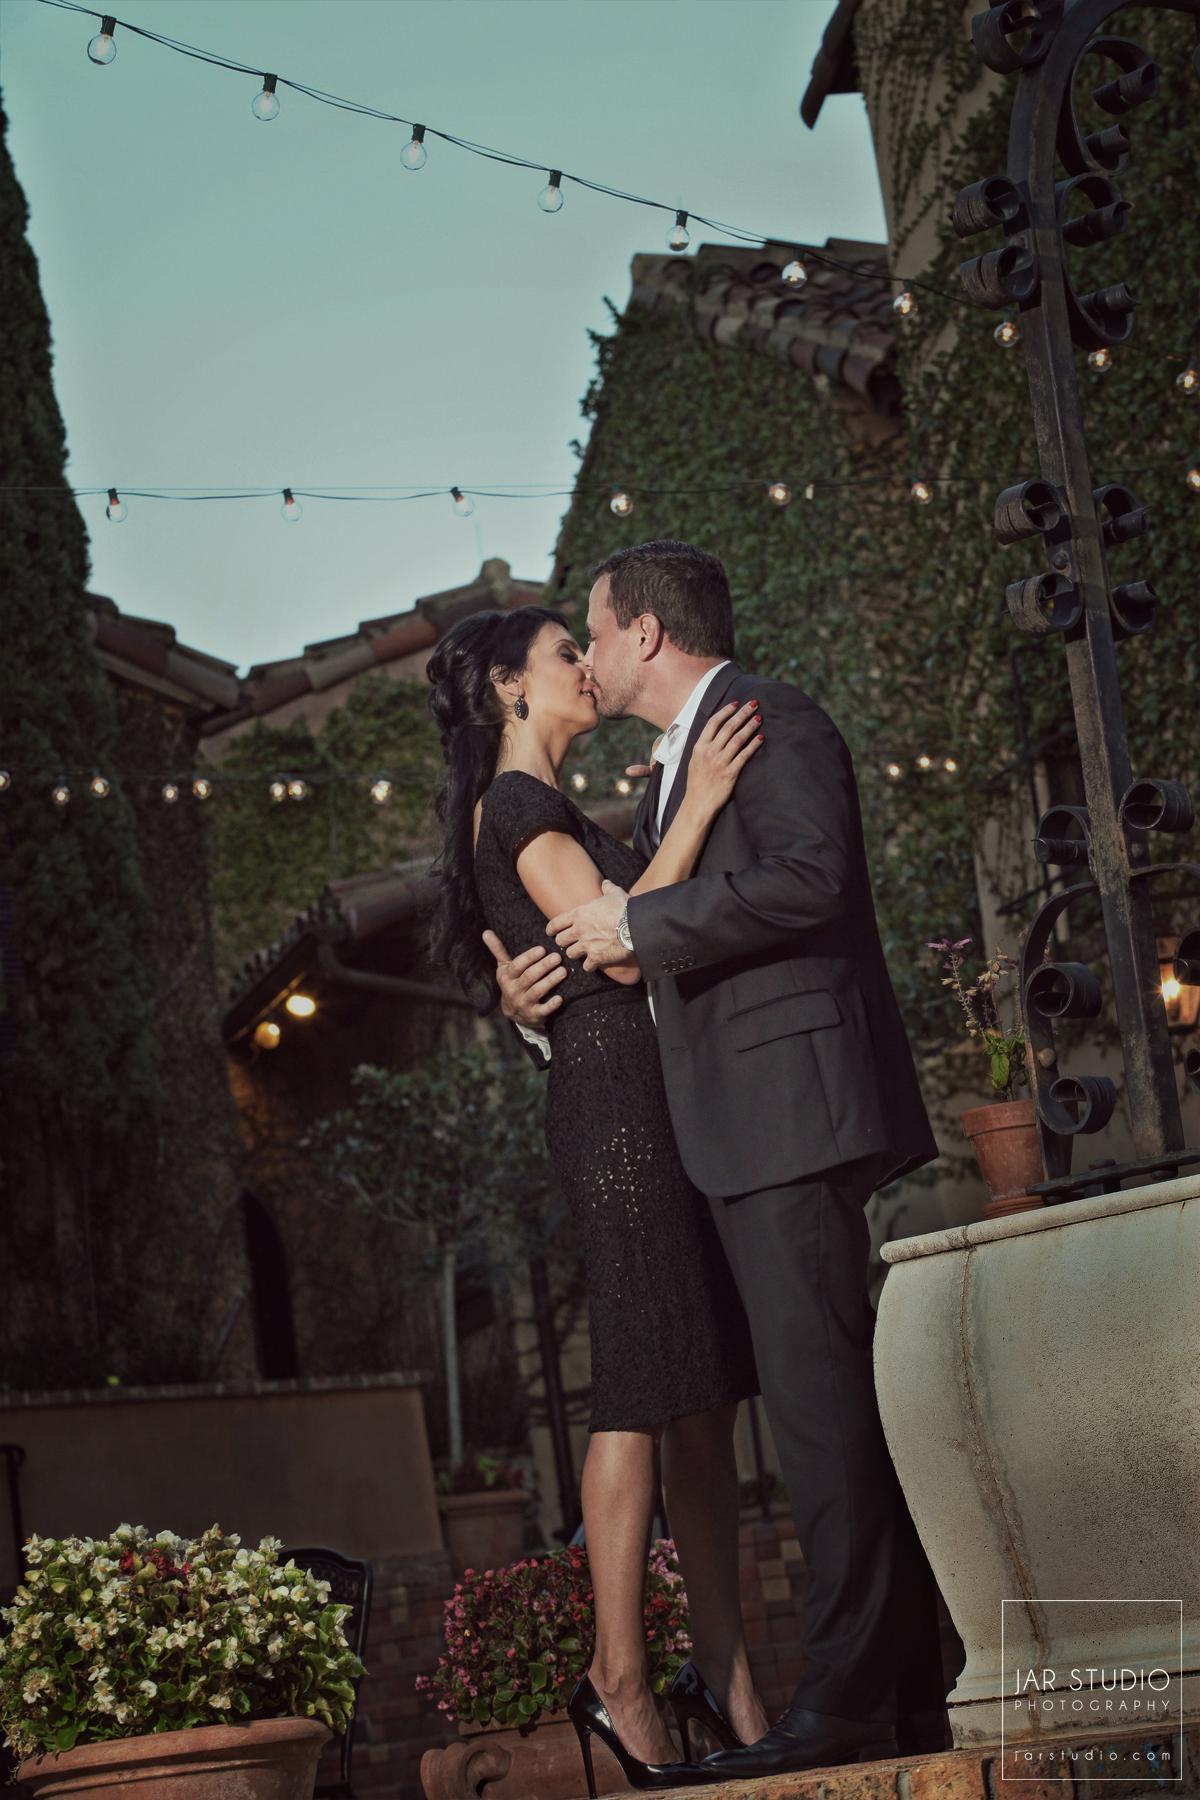 10-bella-collina-luxury-jarstudio-photography.jpg